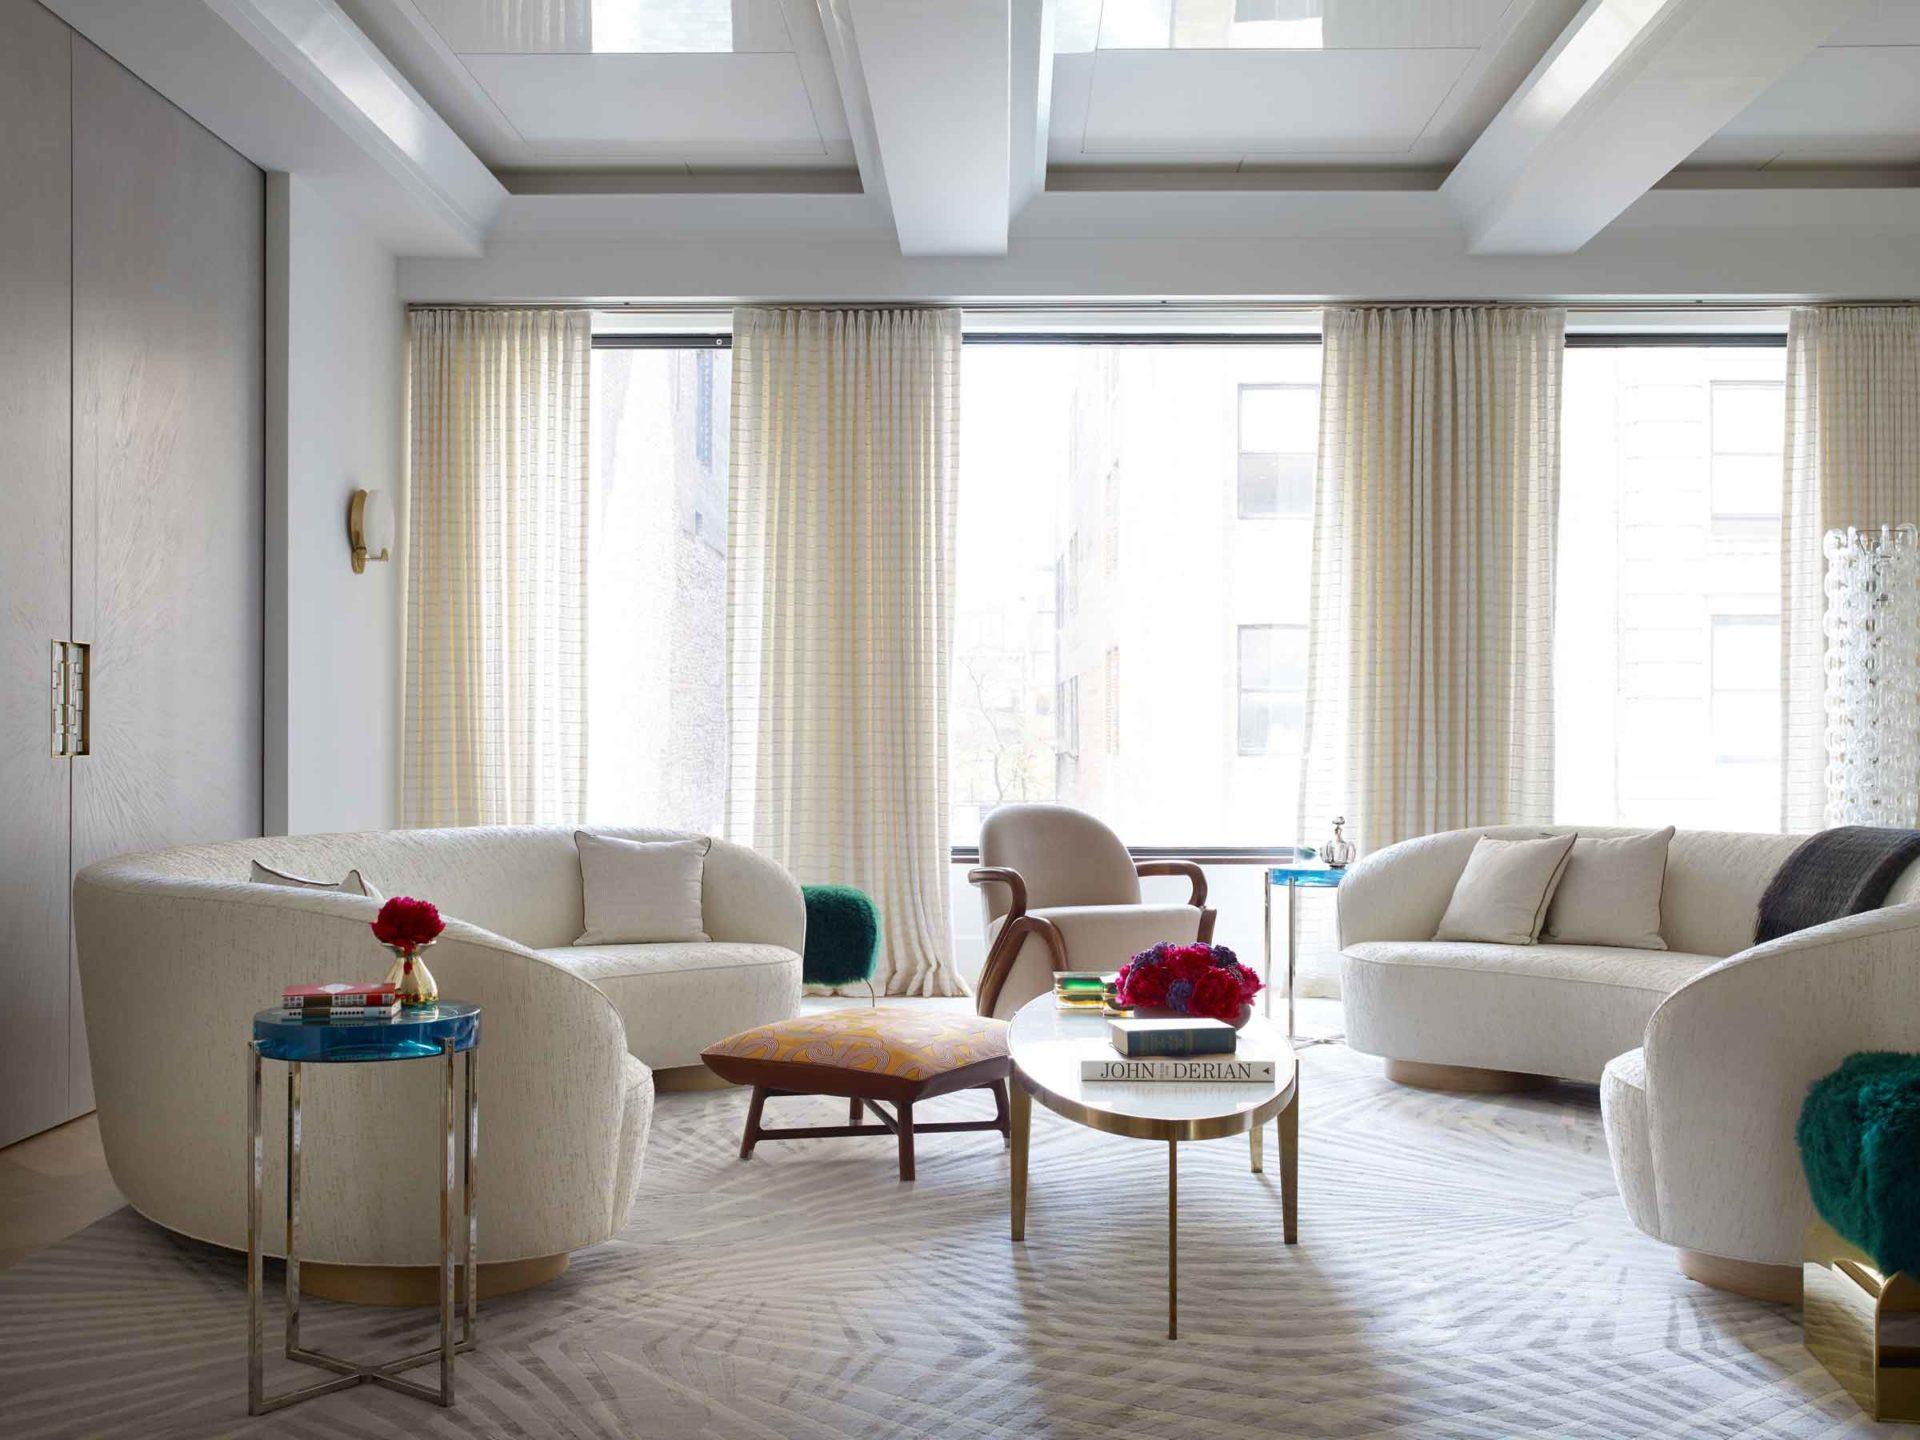 Nicole-Fuller-greenwich-village-living-room-new-york-interior-designer-10